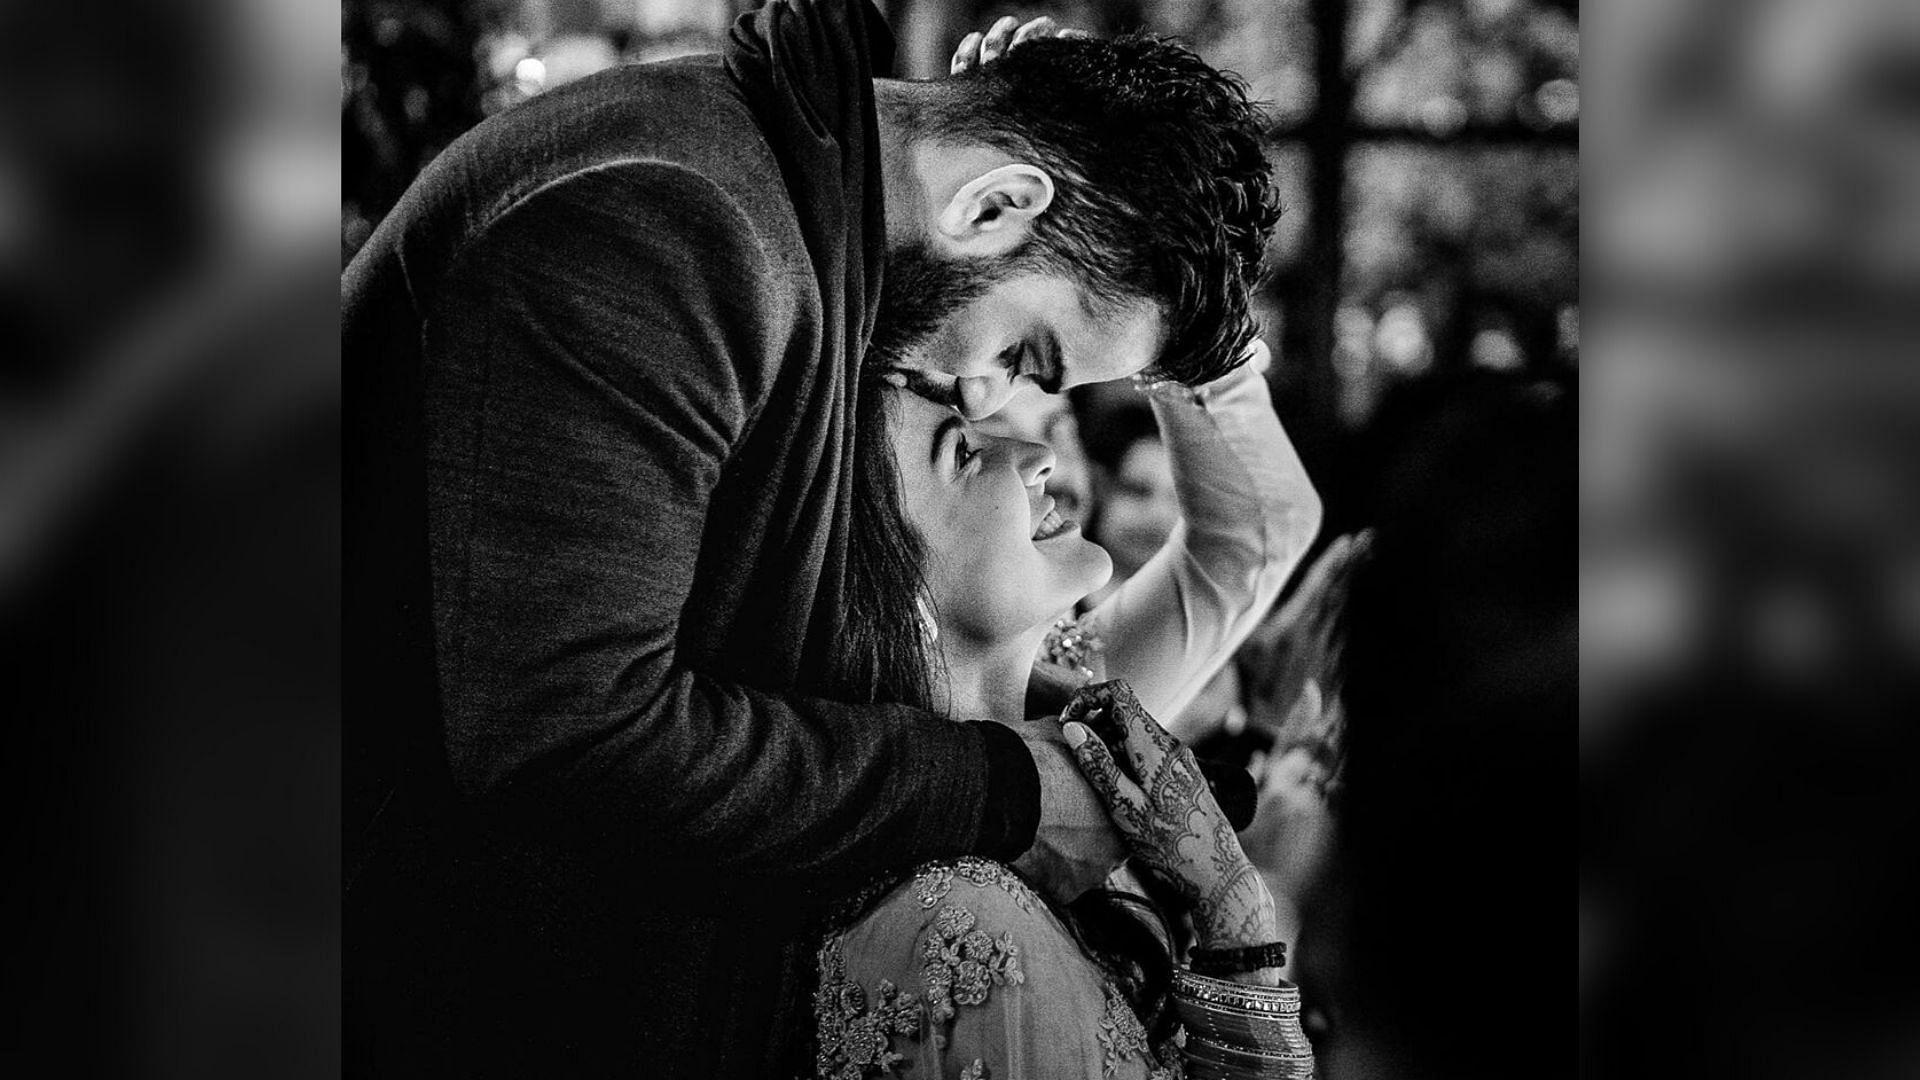 Virat & Anushka's Wedding Anniversary Posts Will Melt Your Heart